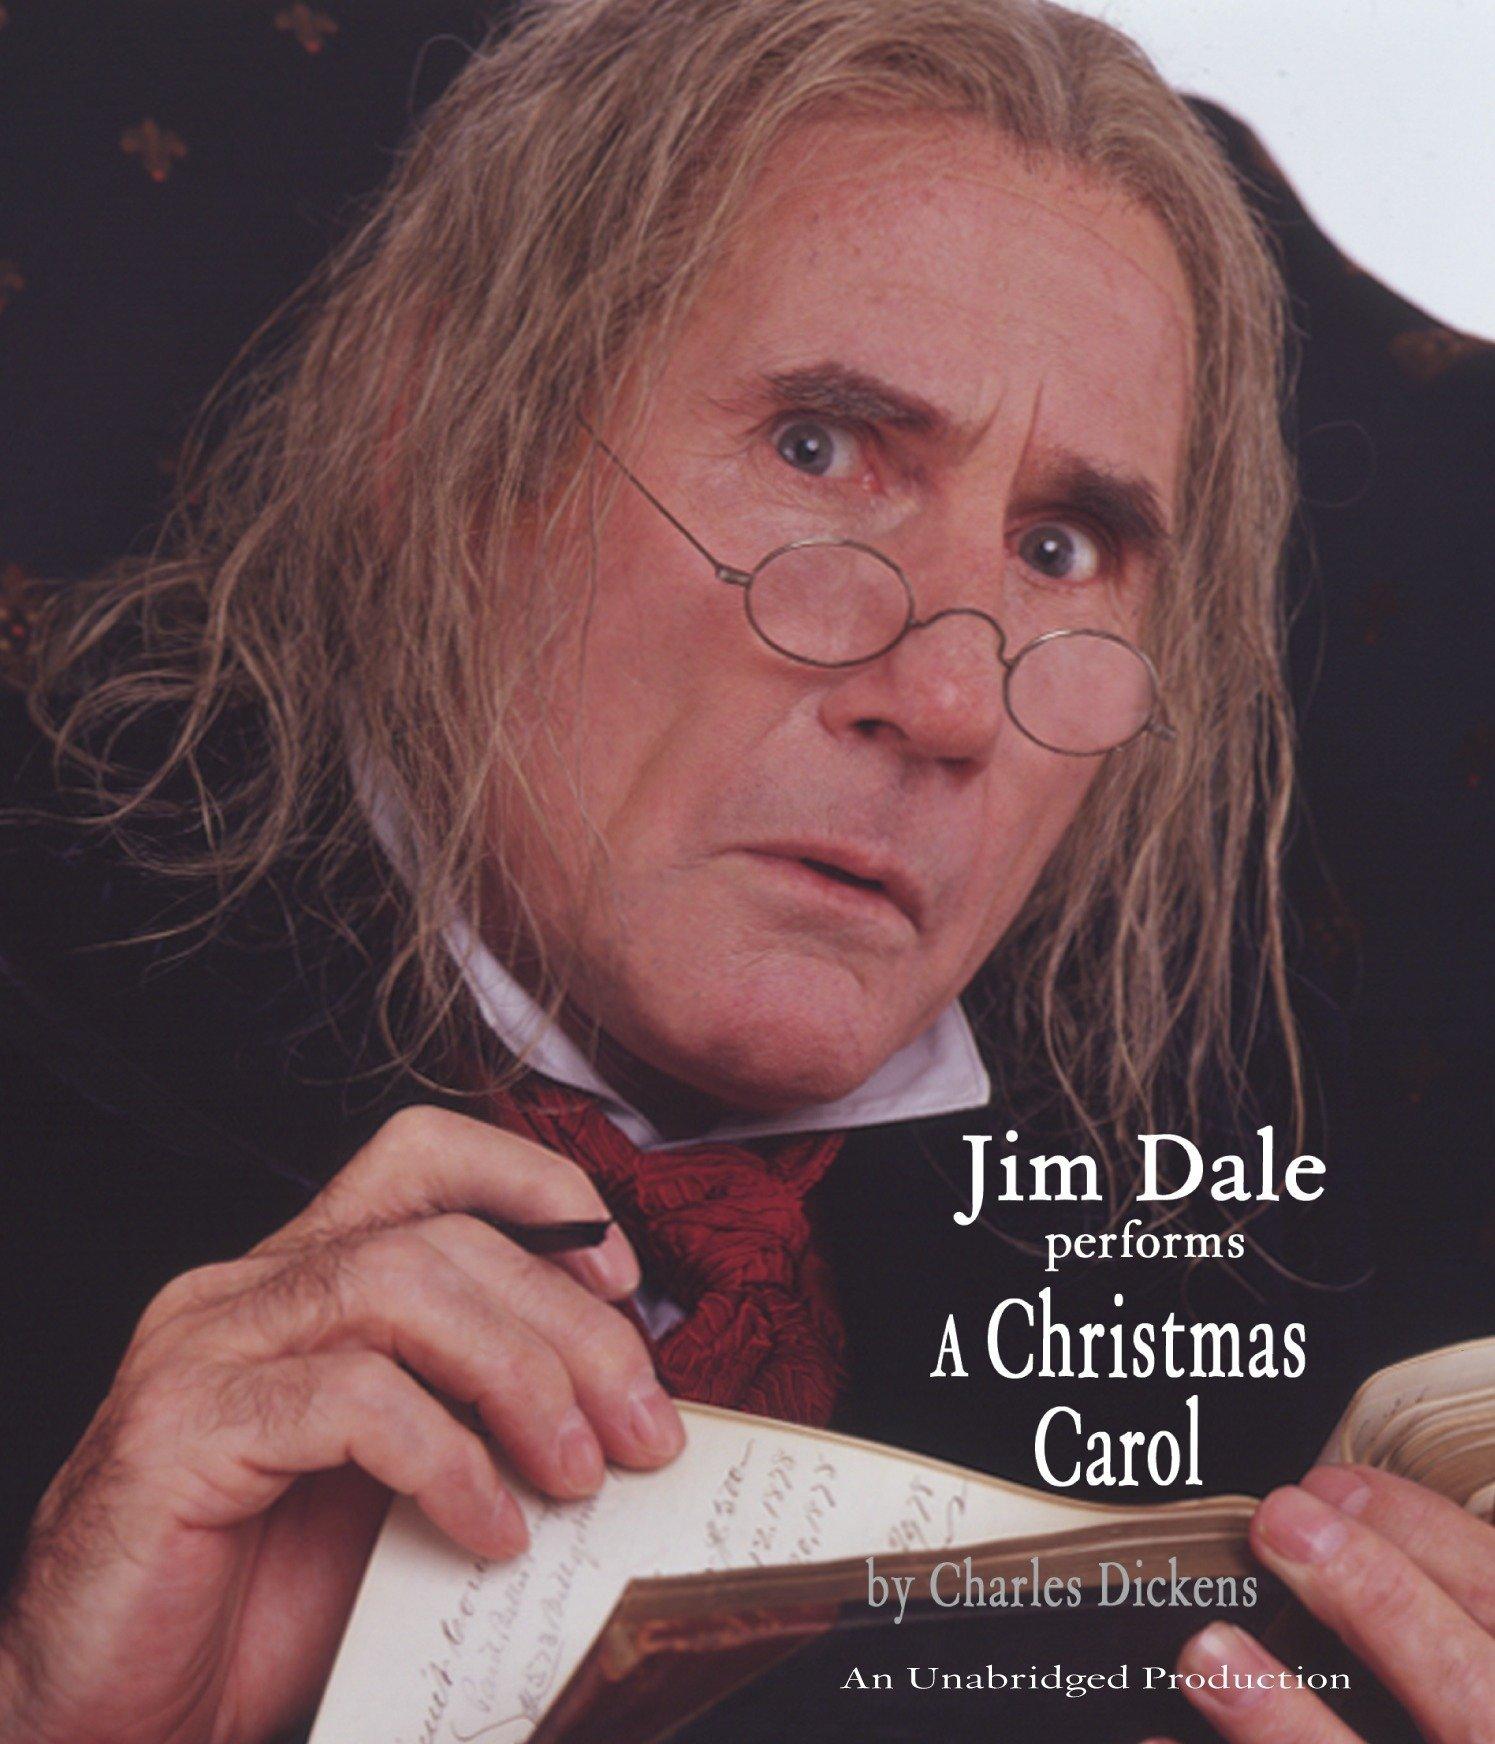 a christmas carol charles dickens jim dale 9781400086030 amazoncom books - Author Of A Christmas Carol